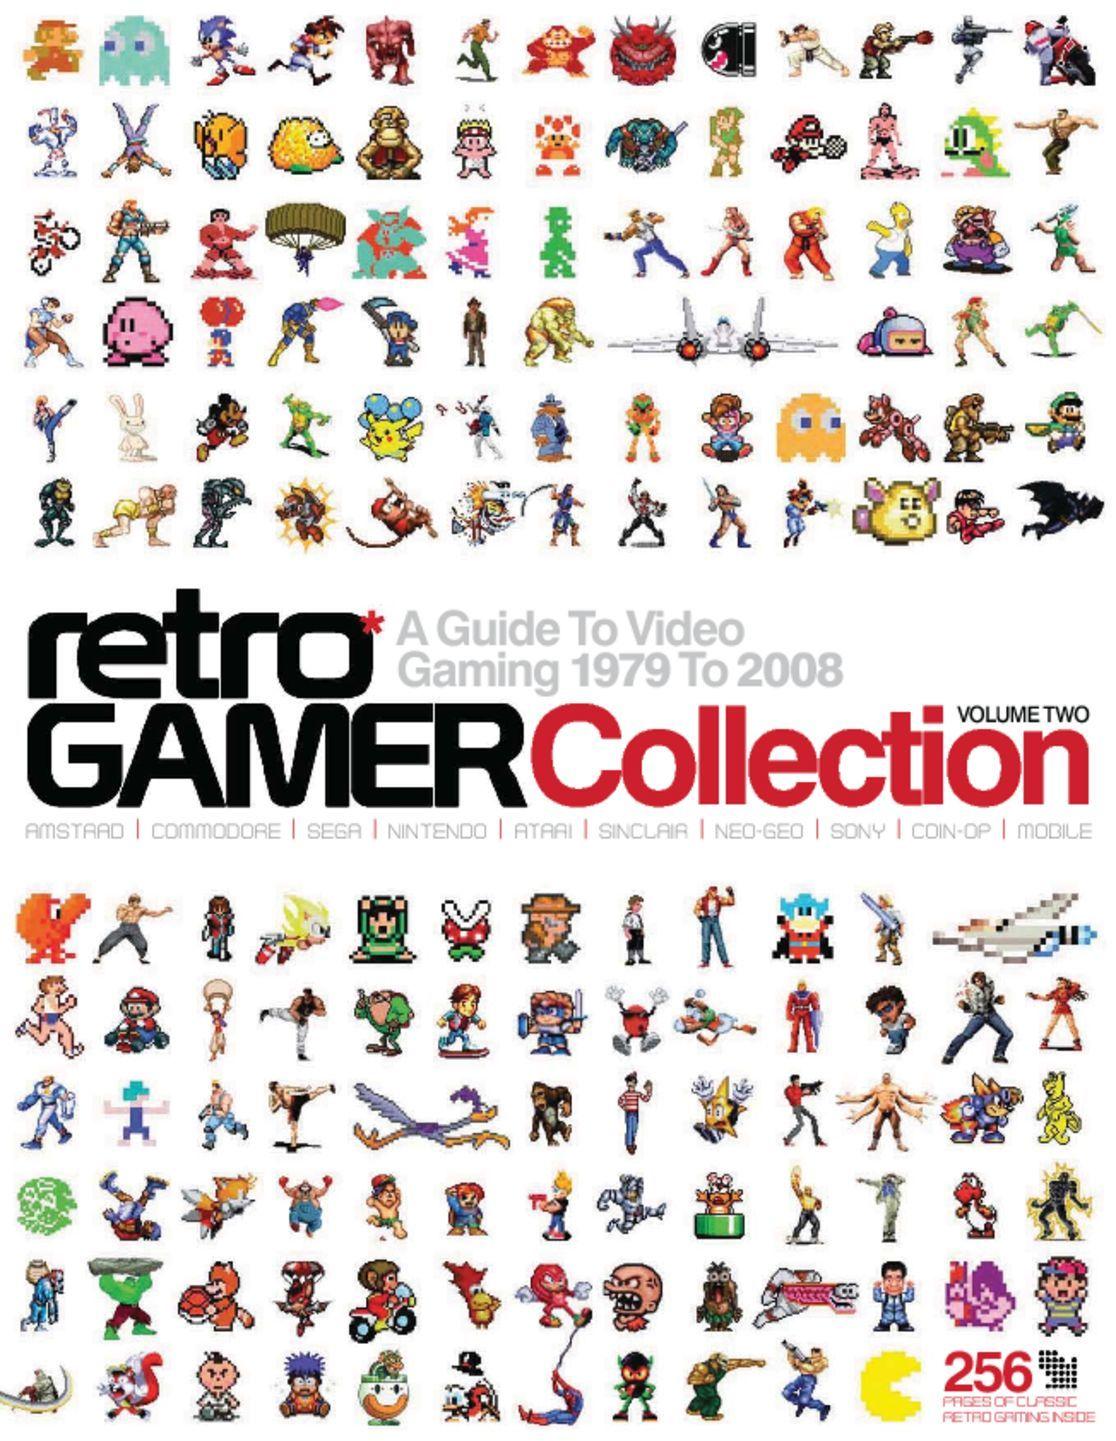 Retro Gamer Collection Vol 2 Digital